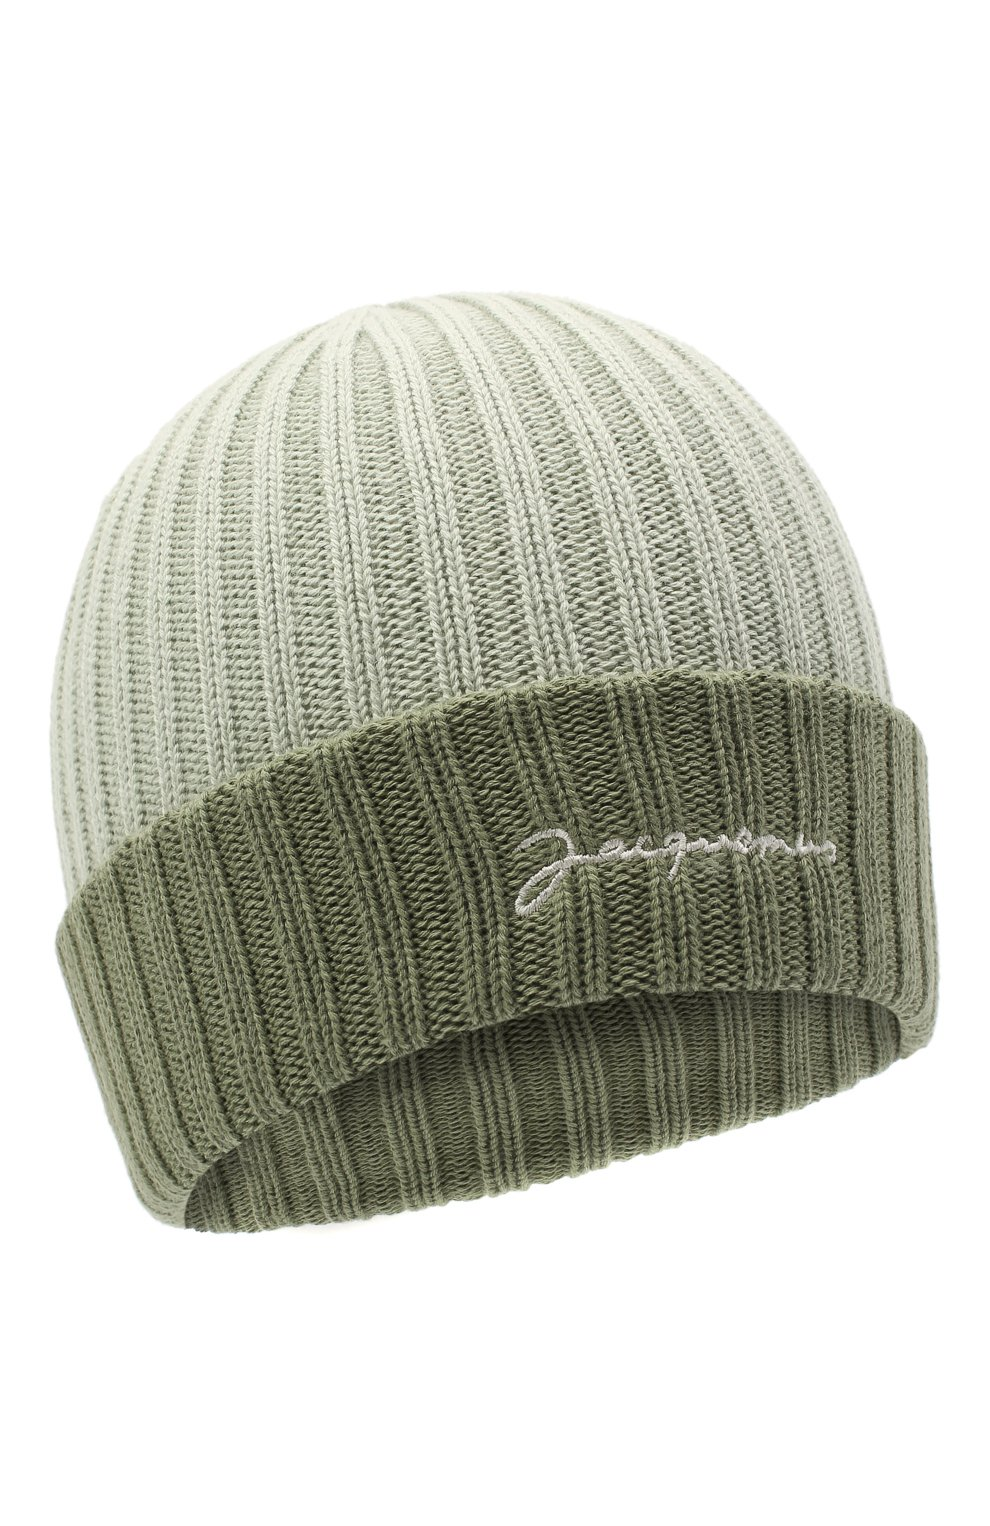 Мужская хлопковая шапка le bonnet JACQUEMUS зеленого цвета, арт. 206AC07/514560 | Фото 1